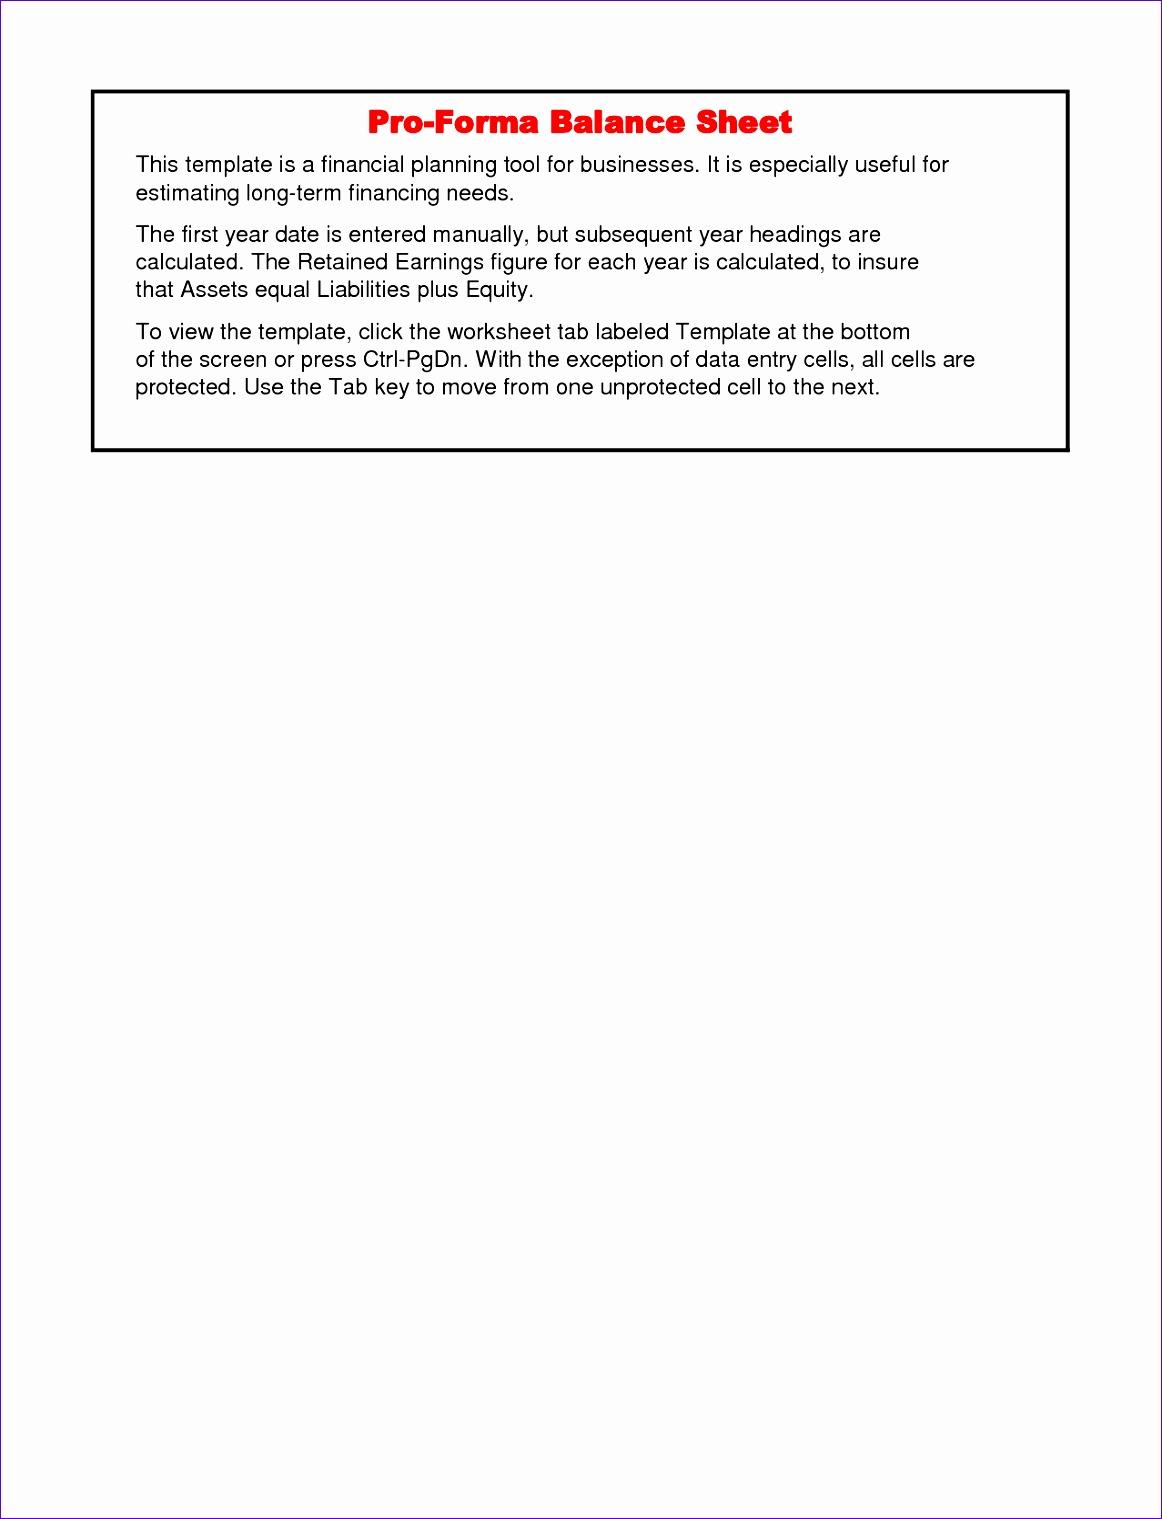 pro forma balance sheet template 1